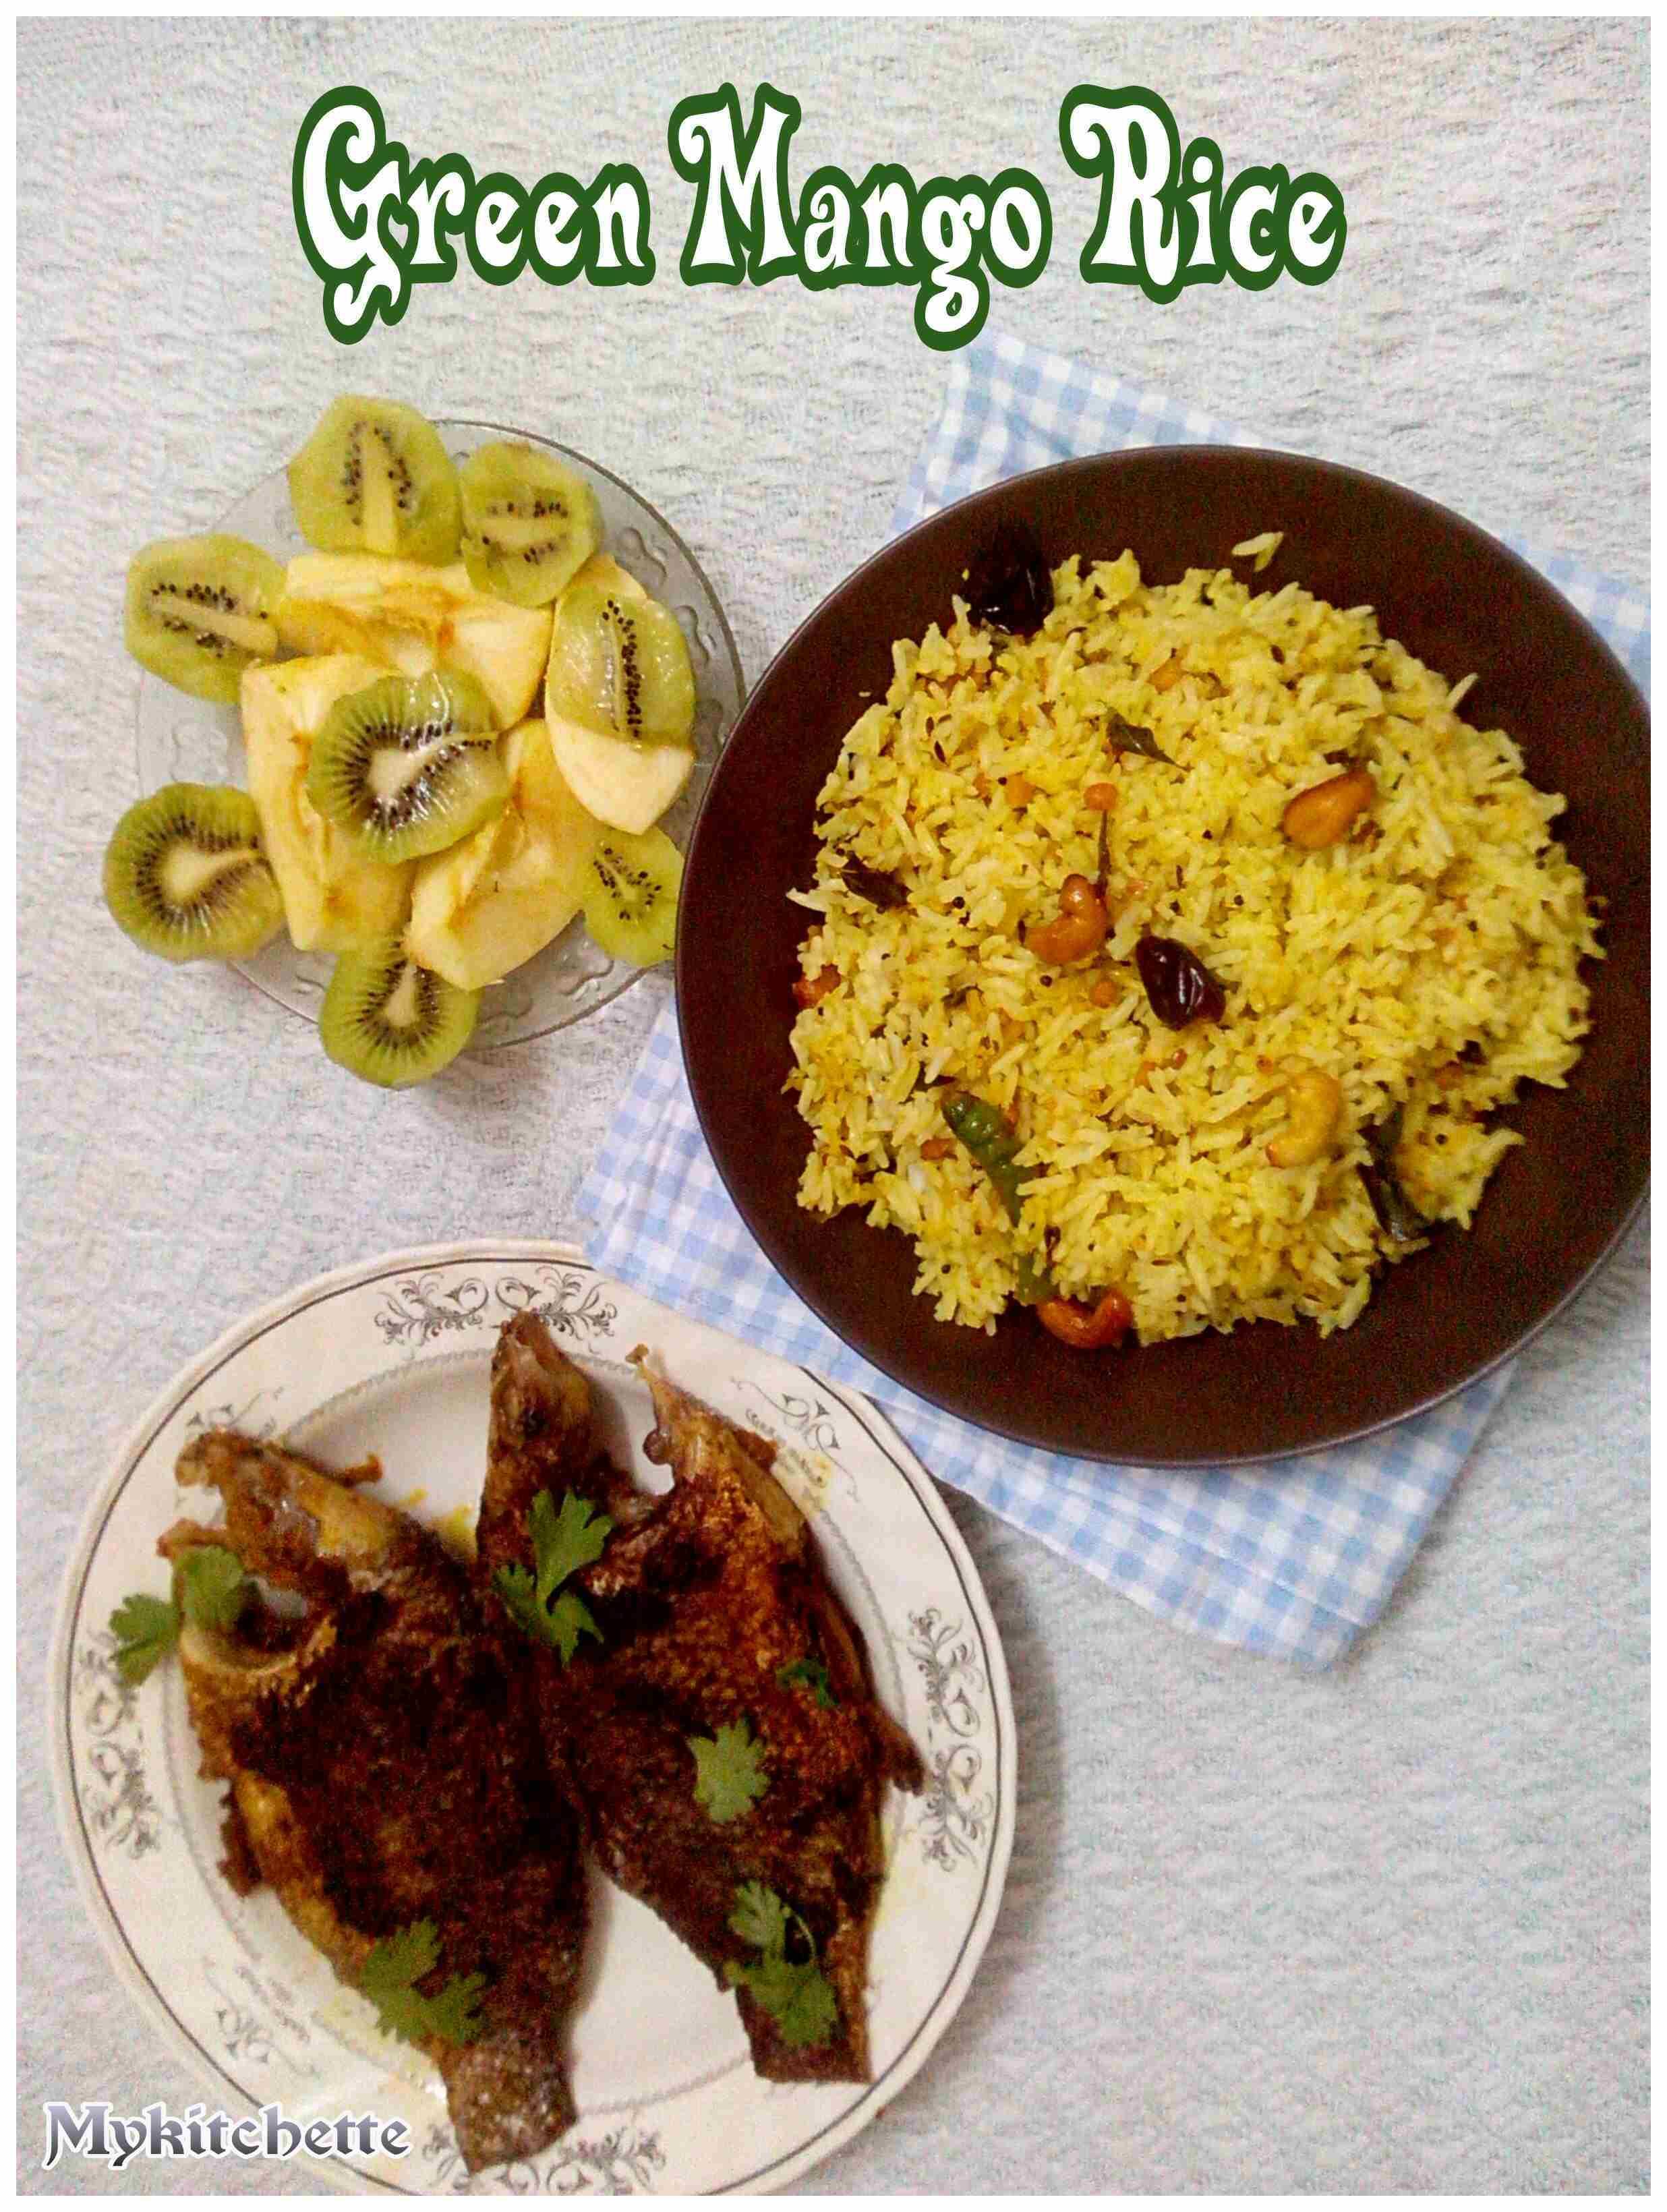 GREEN MANGO RICE AND CHUTNEY | MY KITCHETTE